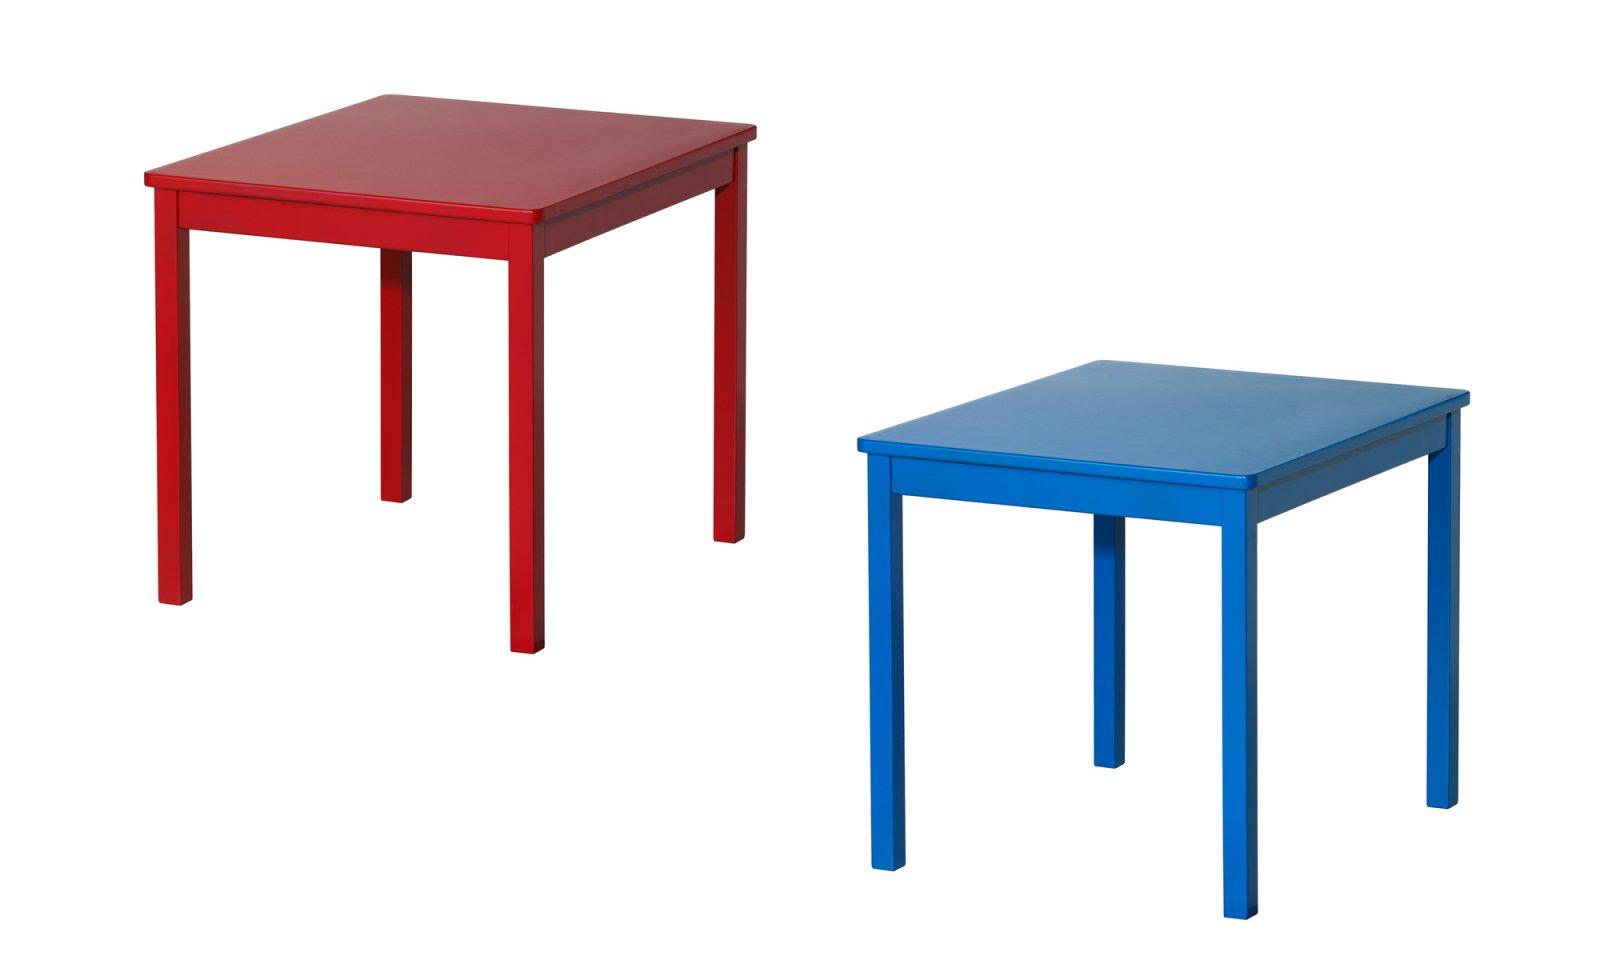 Dormitorio muebles modernos ikea mesas de ninos for Ikea mesas escritorio ninos